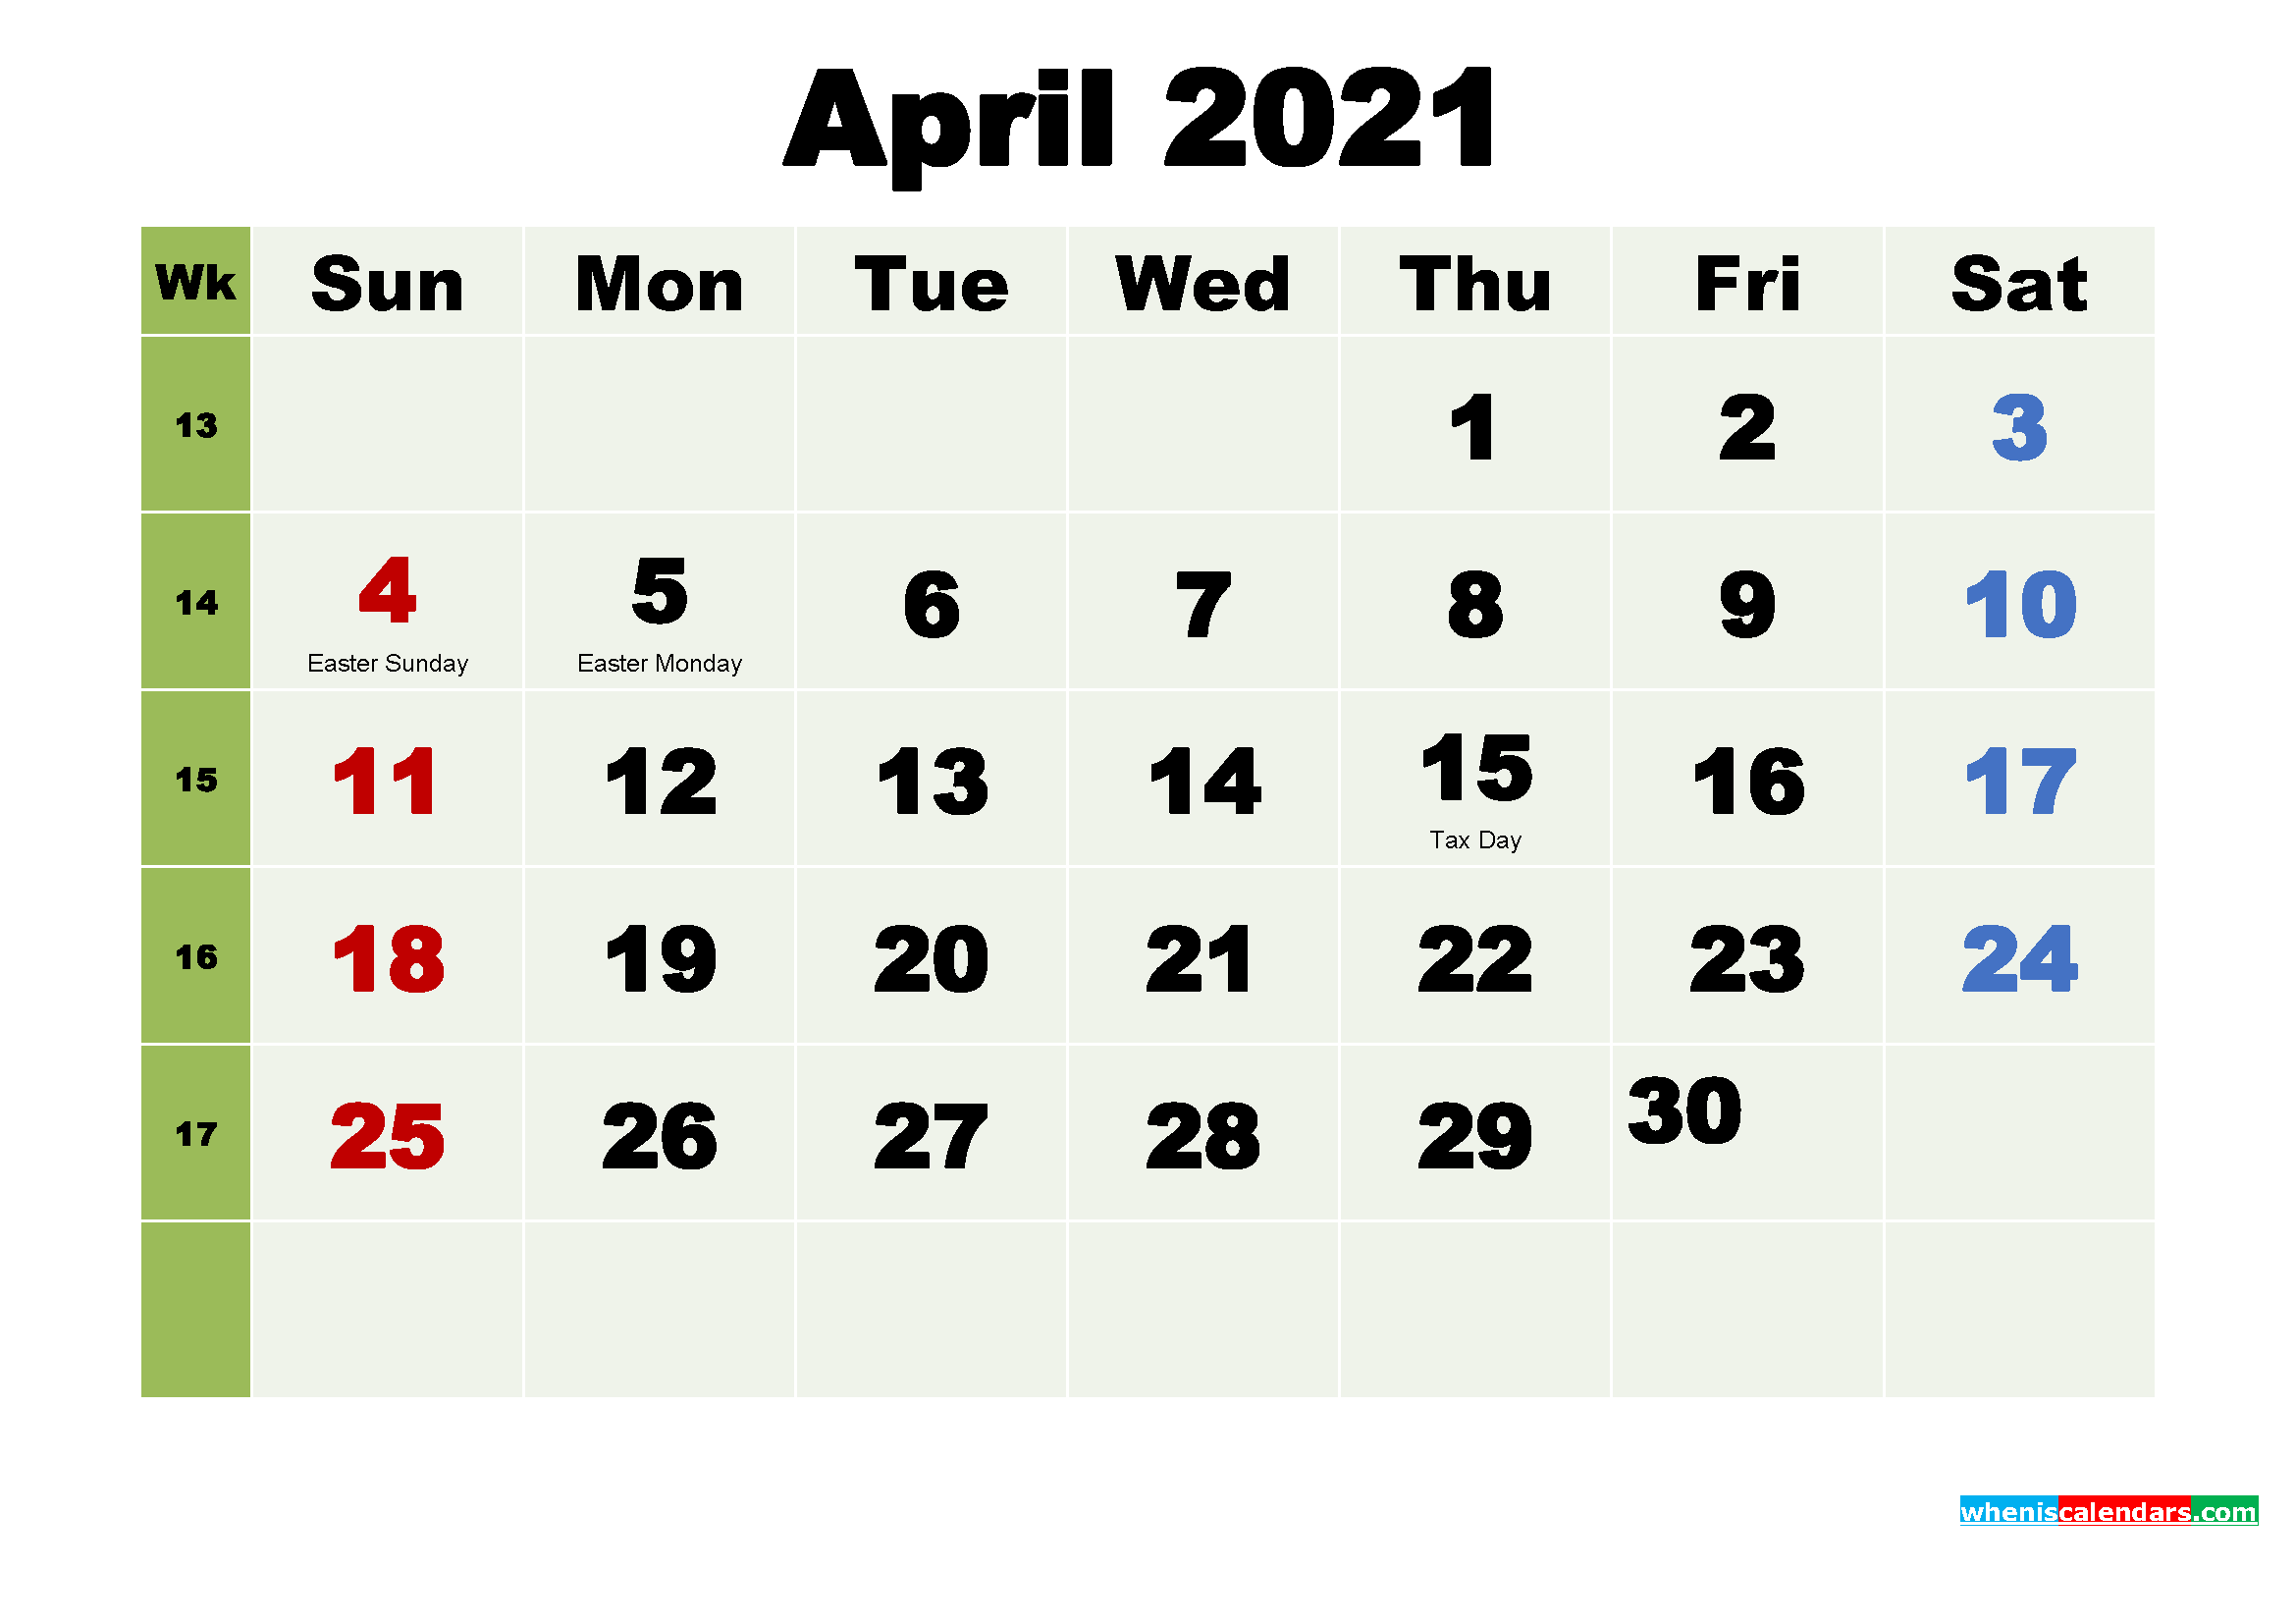 Printable April 2021 Calendar by Month